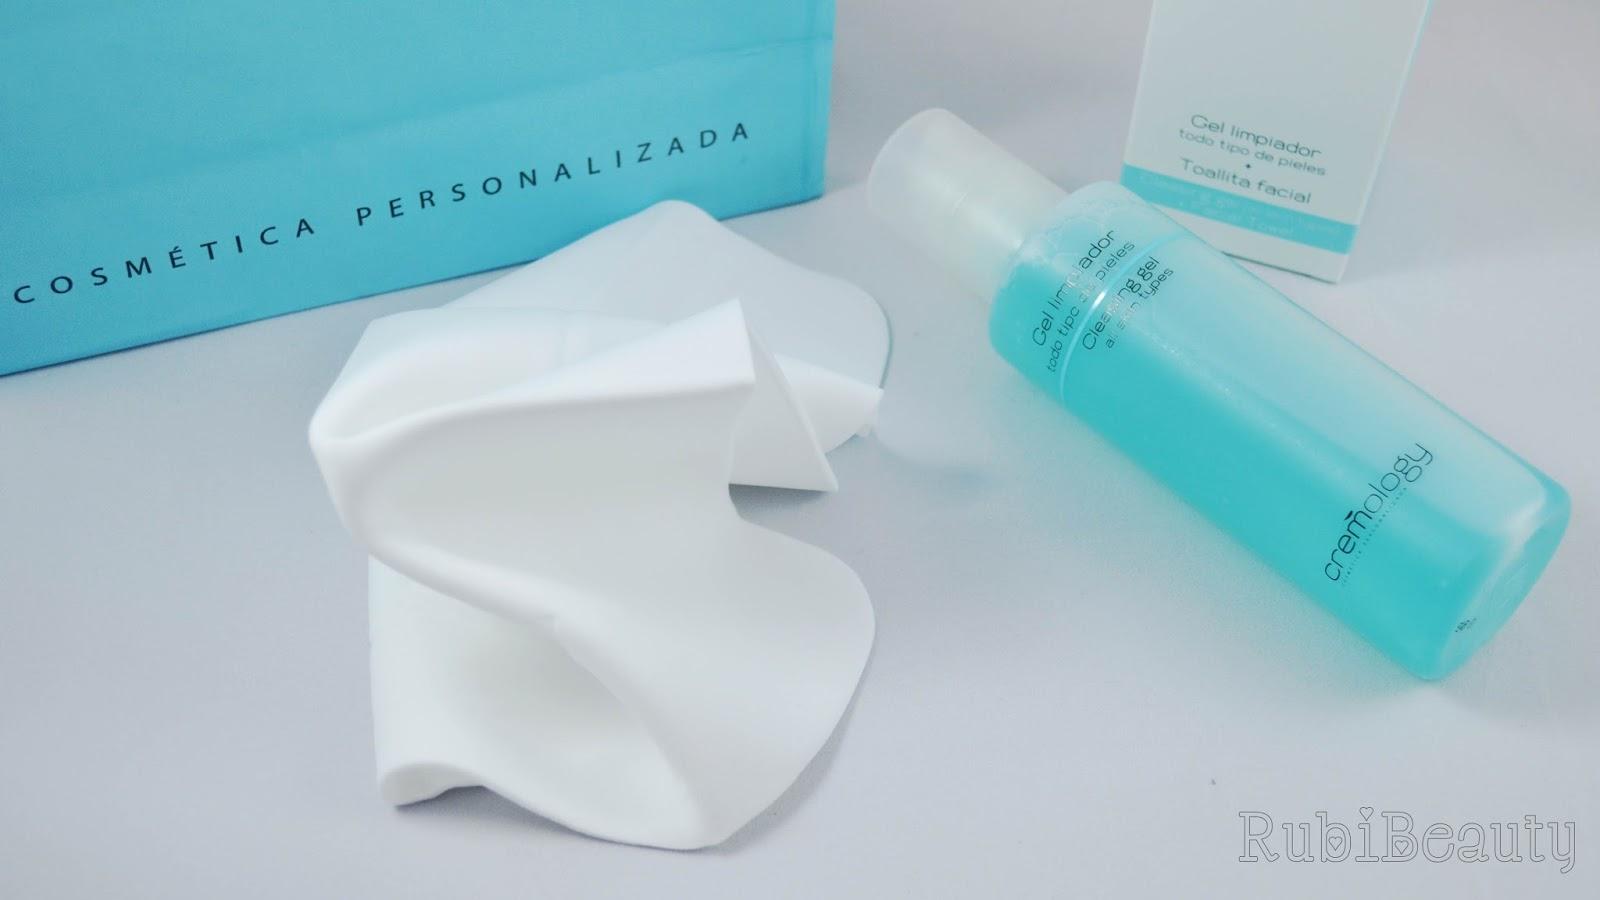 rubibeauty review opinion cremology gel limpiador rutina facial personalizada